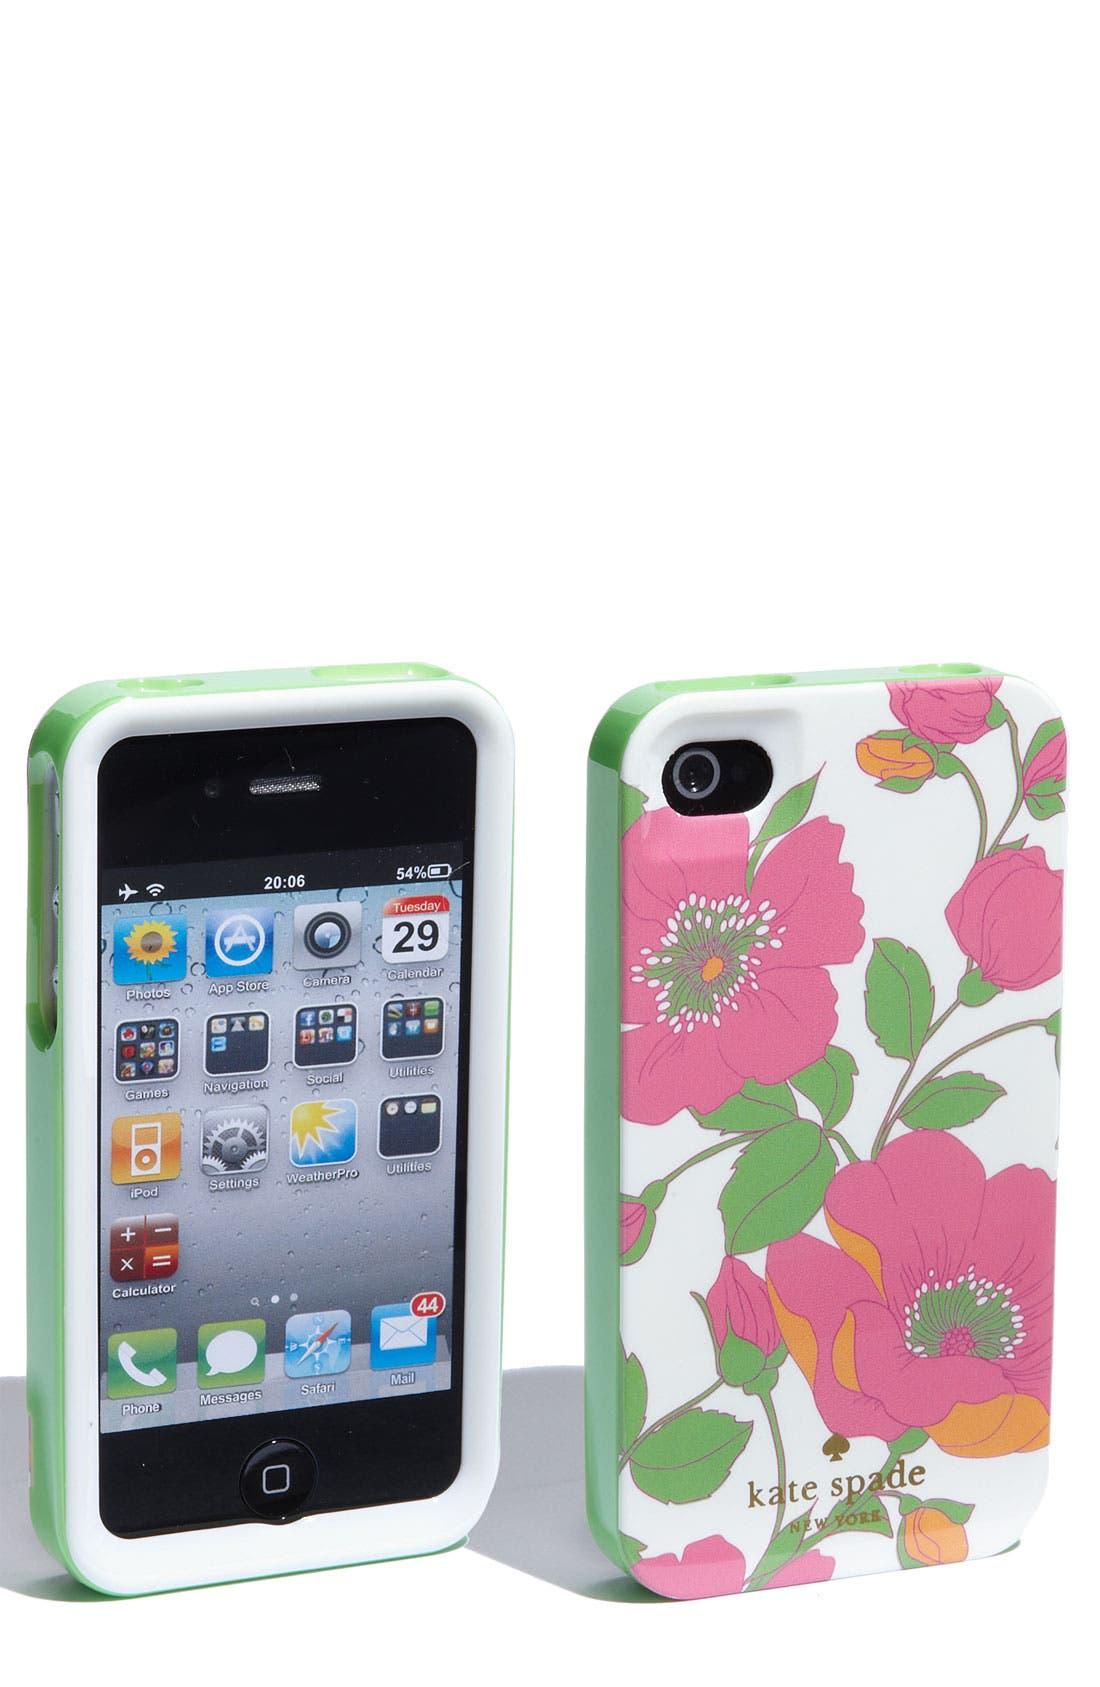 Main Image - kate spade new york 'garden society' iPhone 4 & 4S case